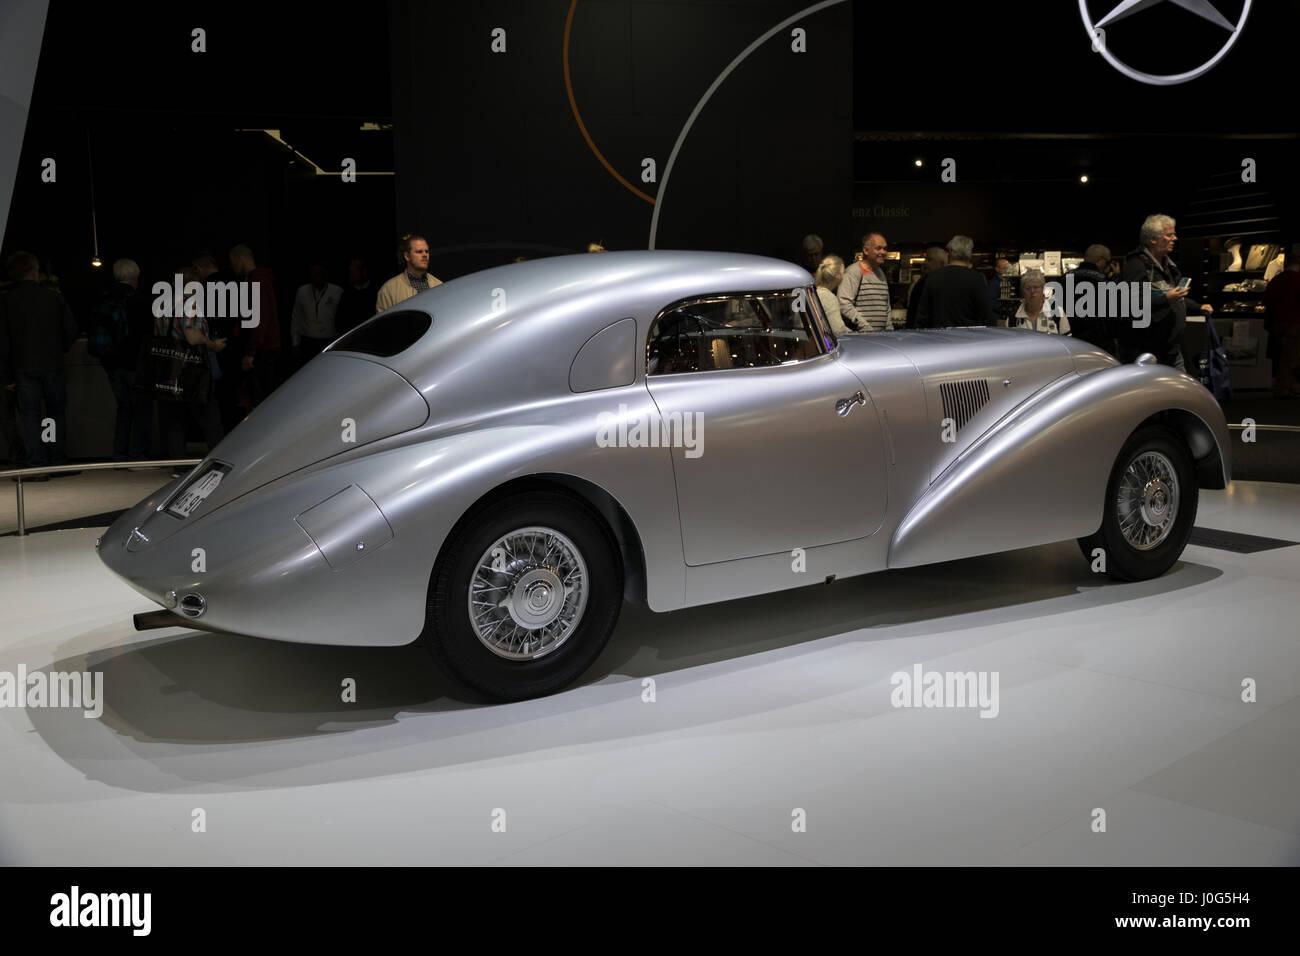 Mercedes benz 540k stock photos mercedes benz 540k stock for Mercedes benz 0 apr